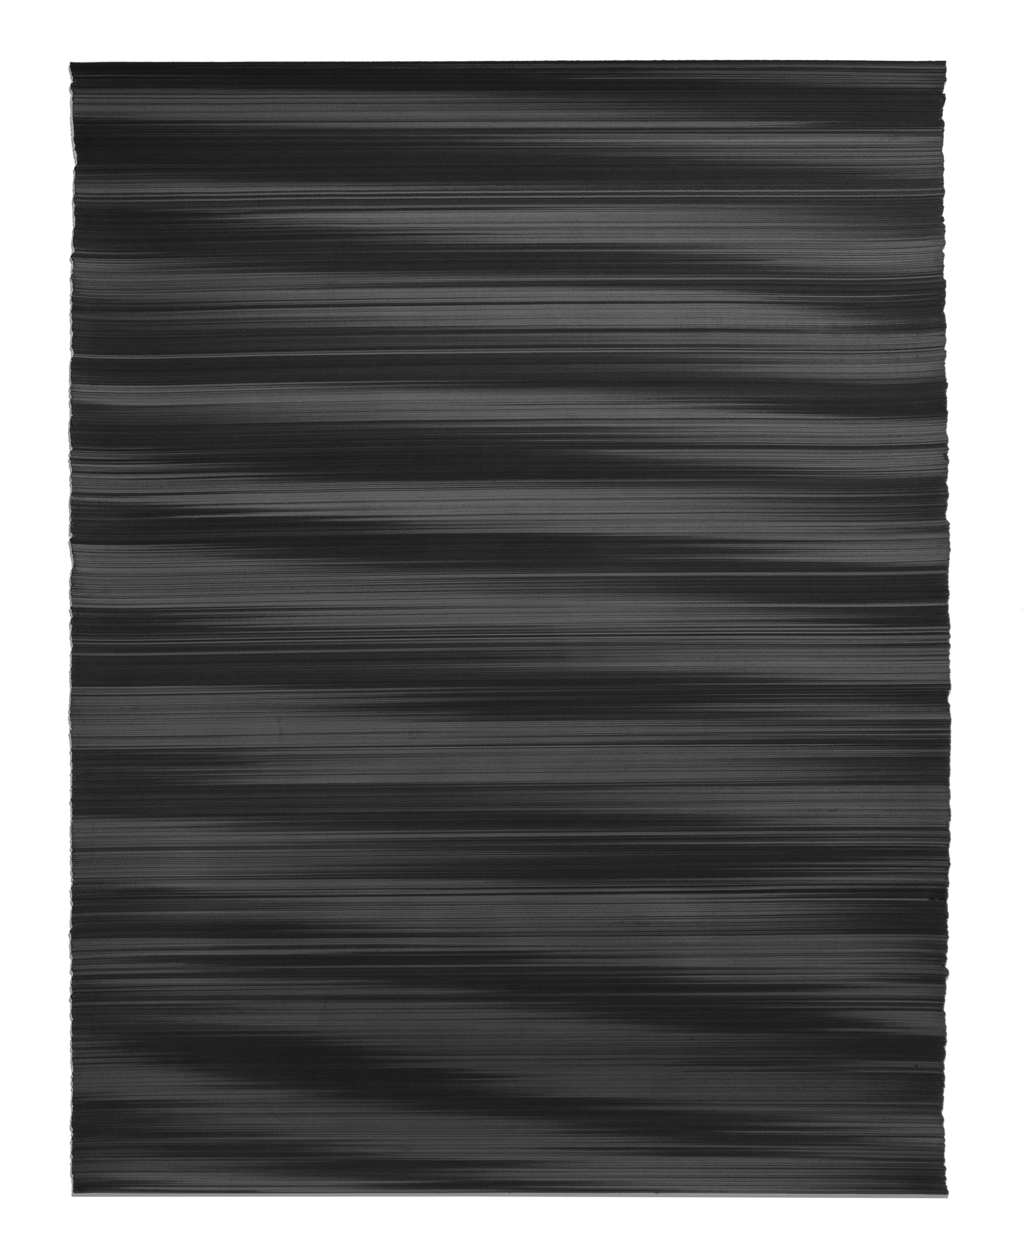 00e1b1a3853ee01b-WavesinblackNo1.jpg